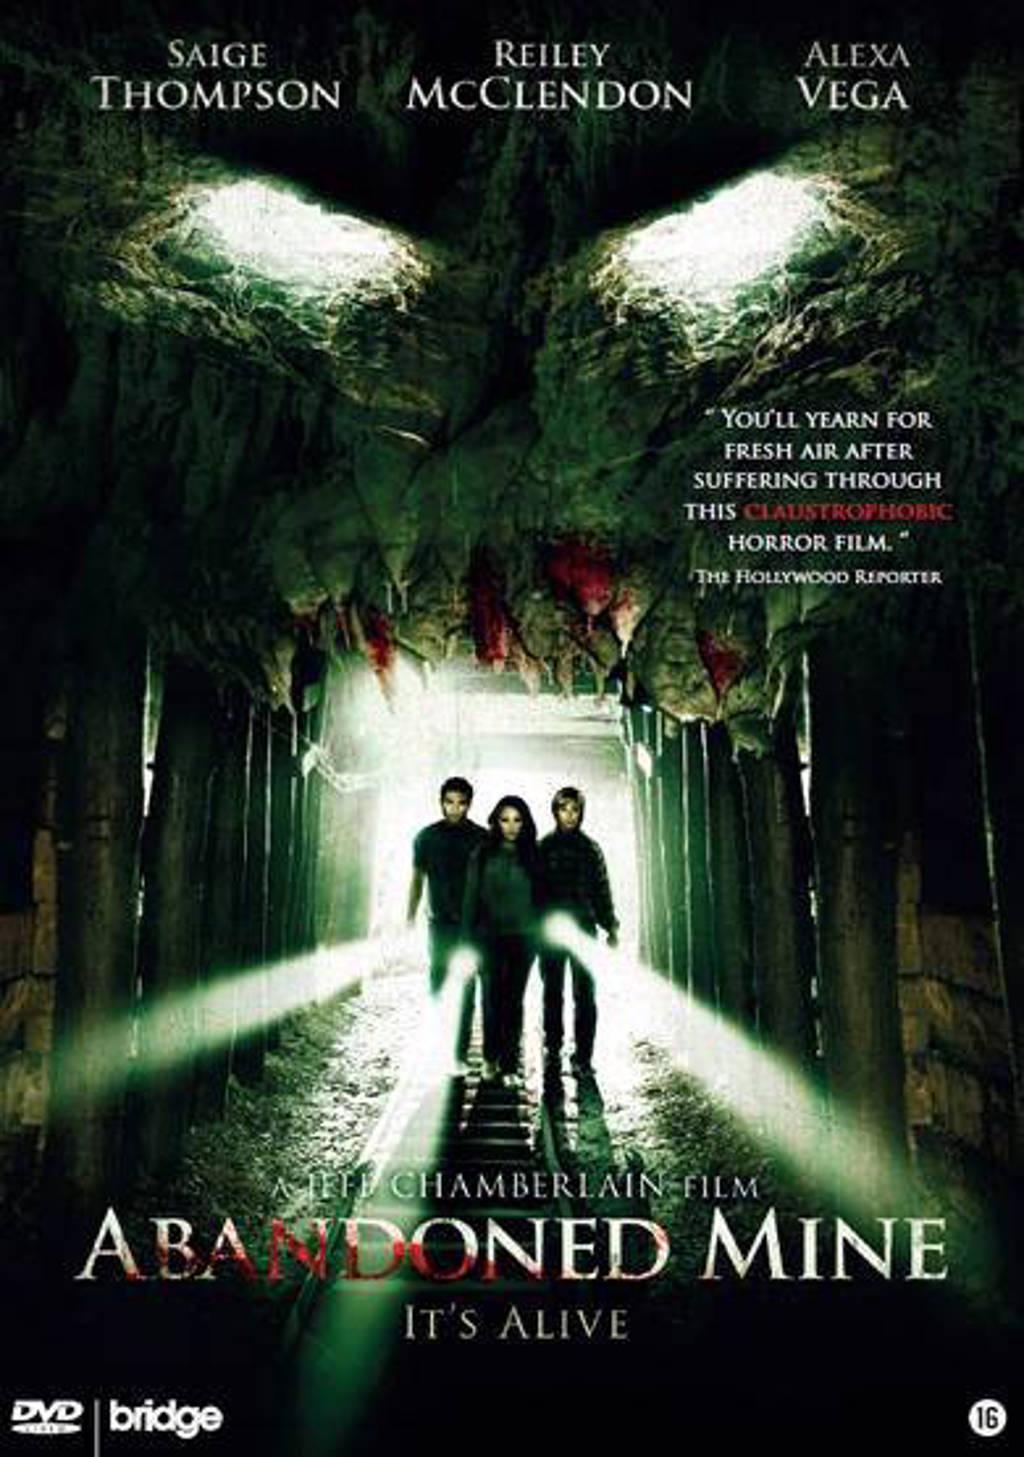 Abandoned mine (DVD)